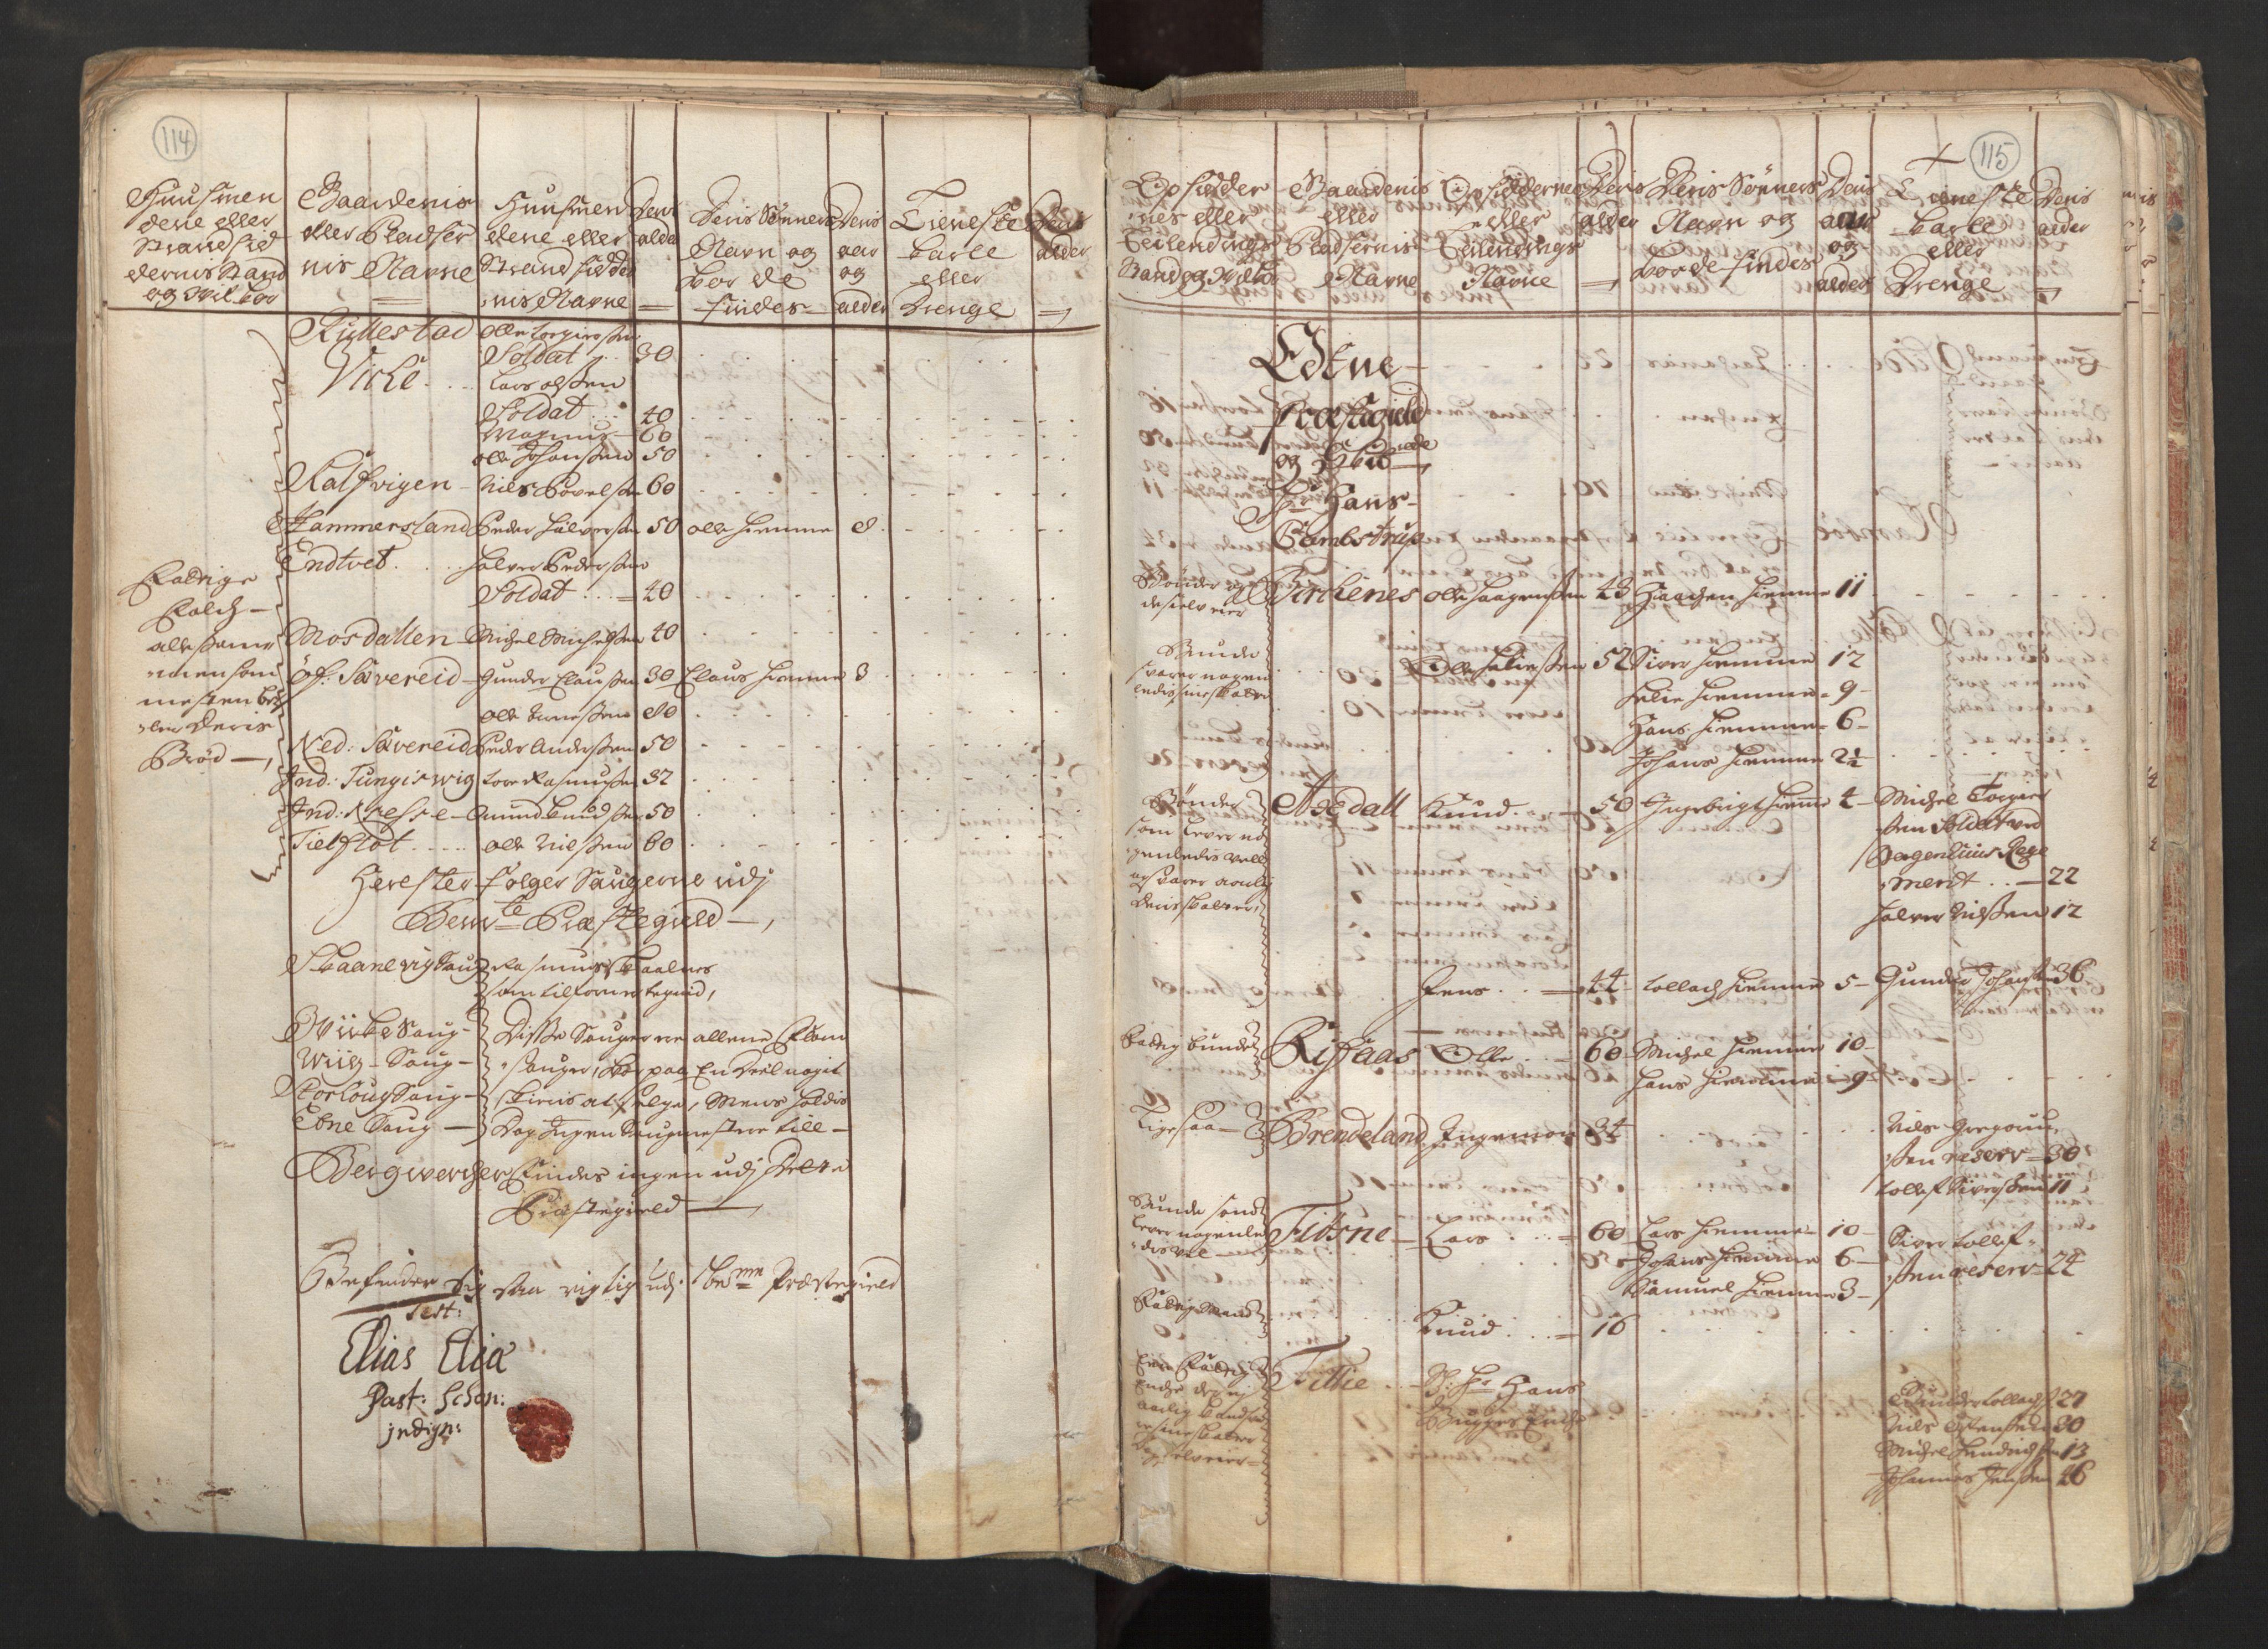 RA, Manntallet 1701, nr. 6: Sunnhordland fogderi og Hardanger fogderi, 1701, s. 114-115